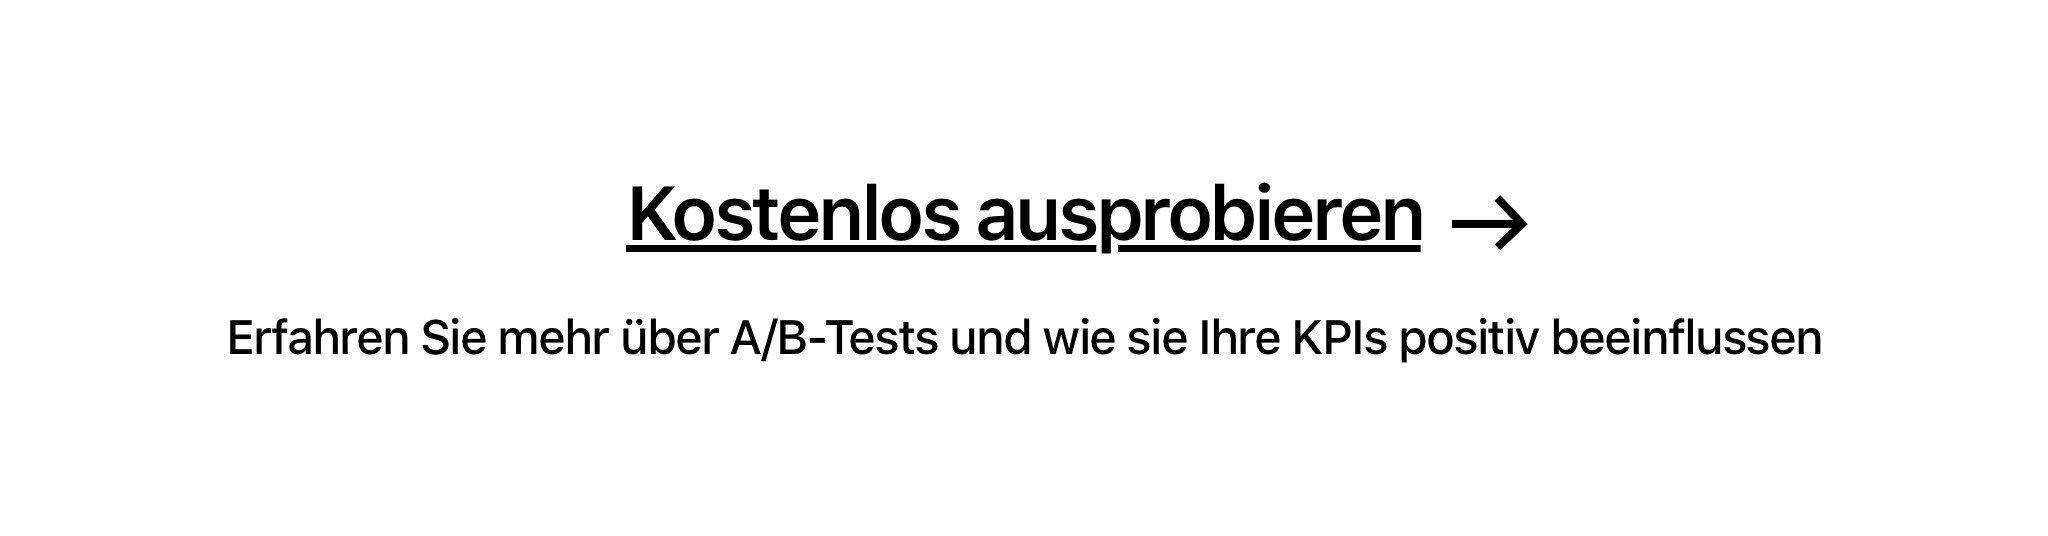 Ab Testing Guide German Banner 6